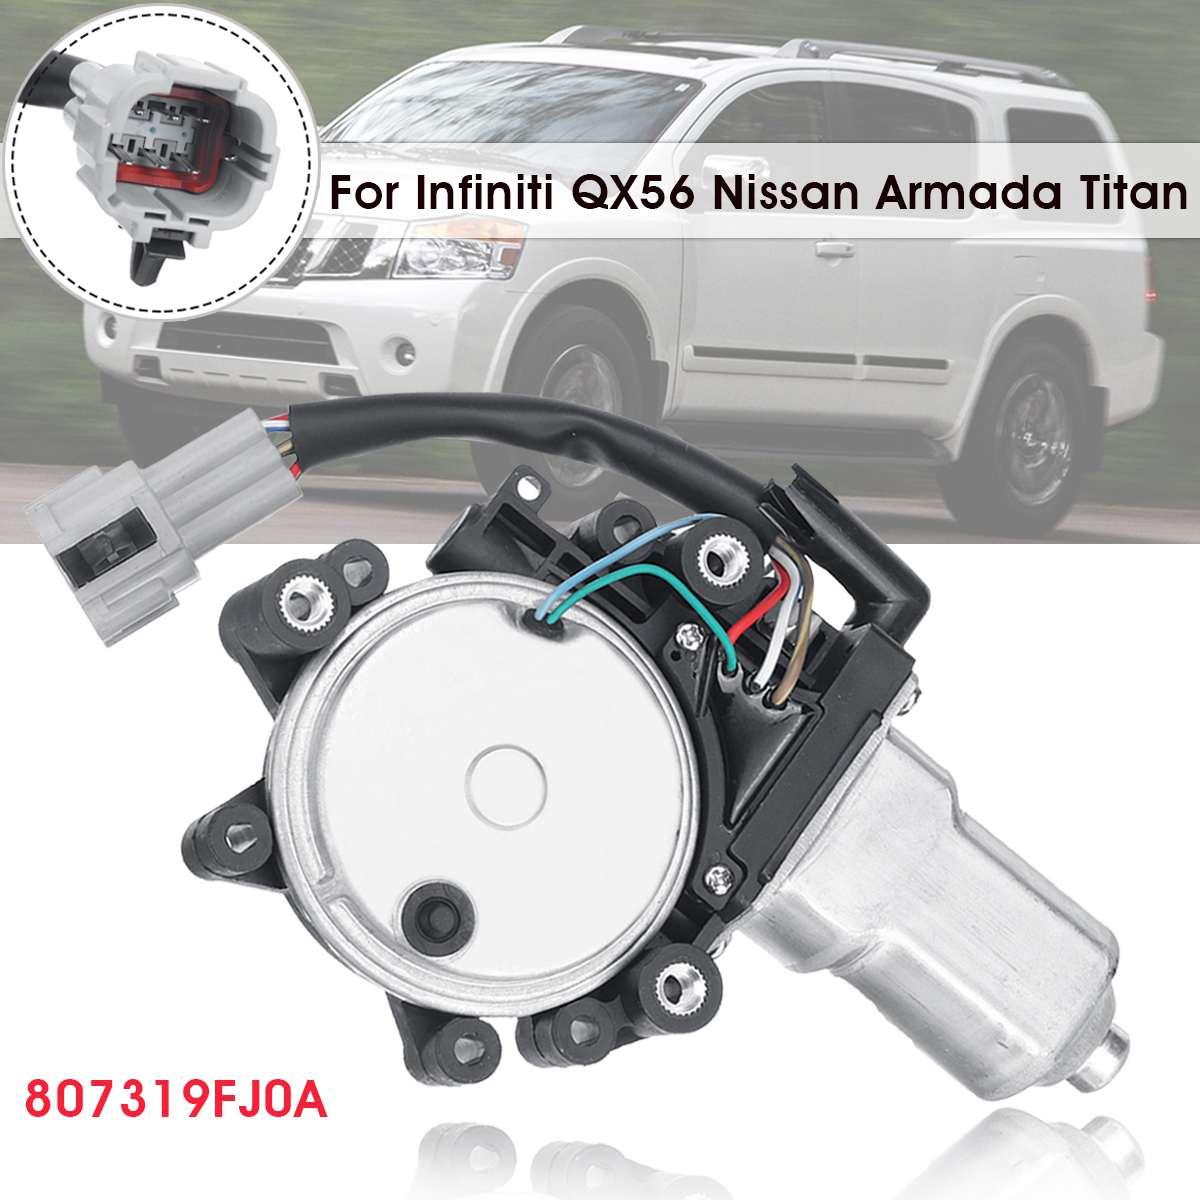 807319FJ0A Front Left Driver Side Window Motor For Infiniti QX56 For Nissan 2004-2014 Armada Titan 807319-FJ0A